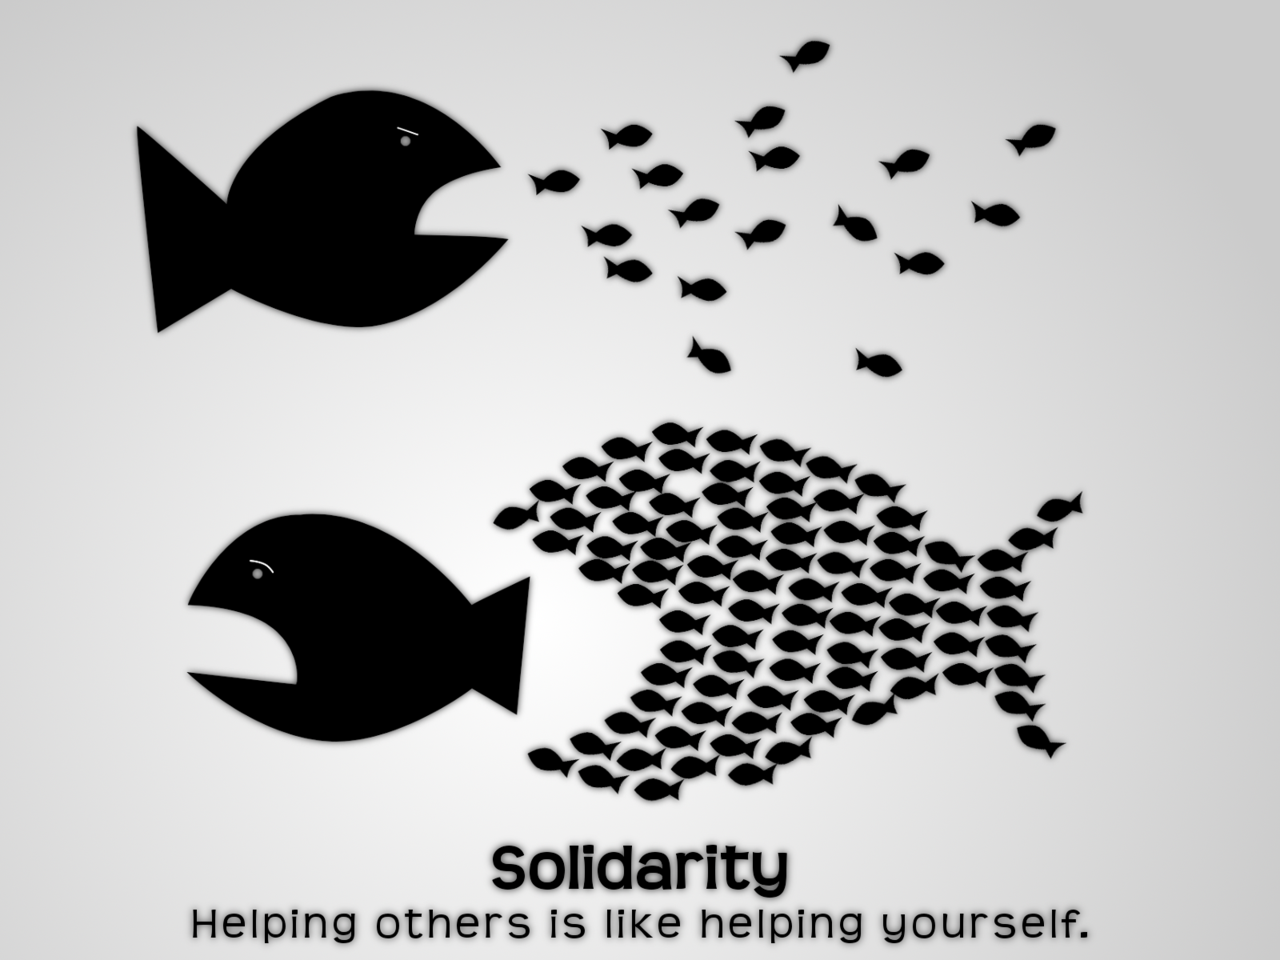 solidarity_by_matzek